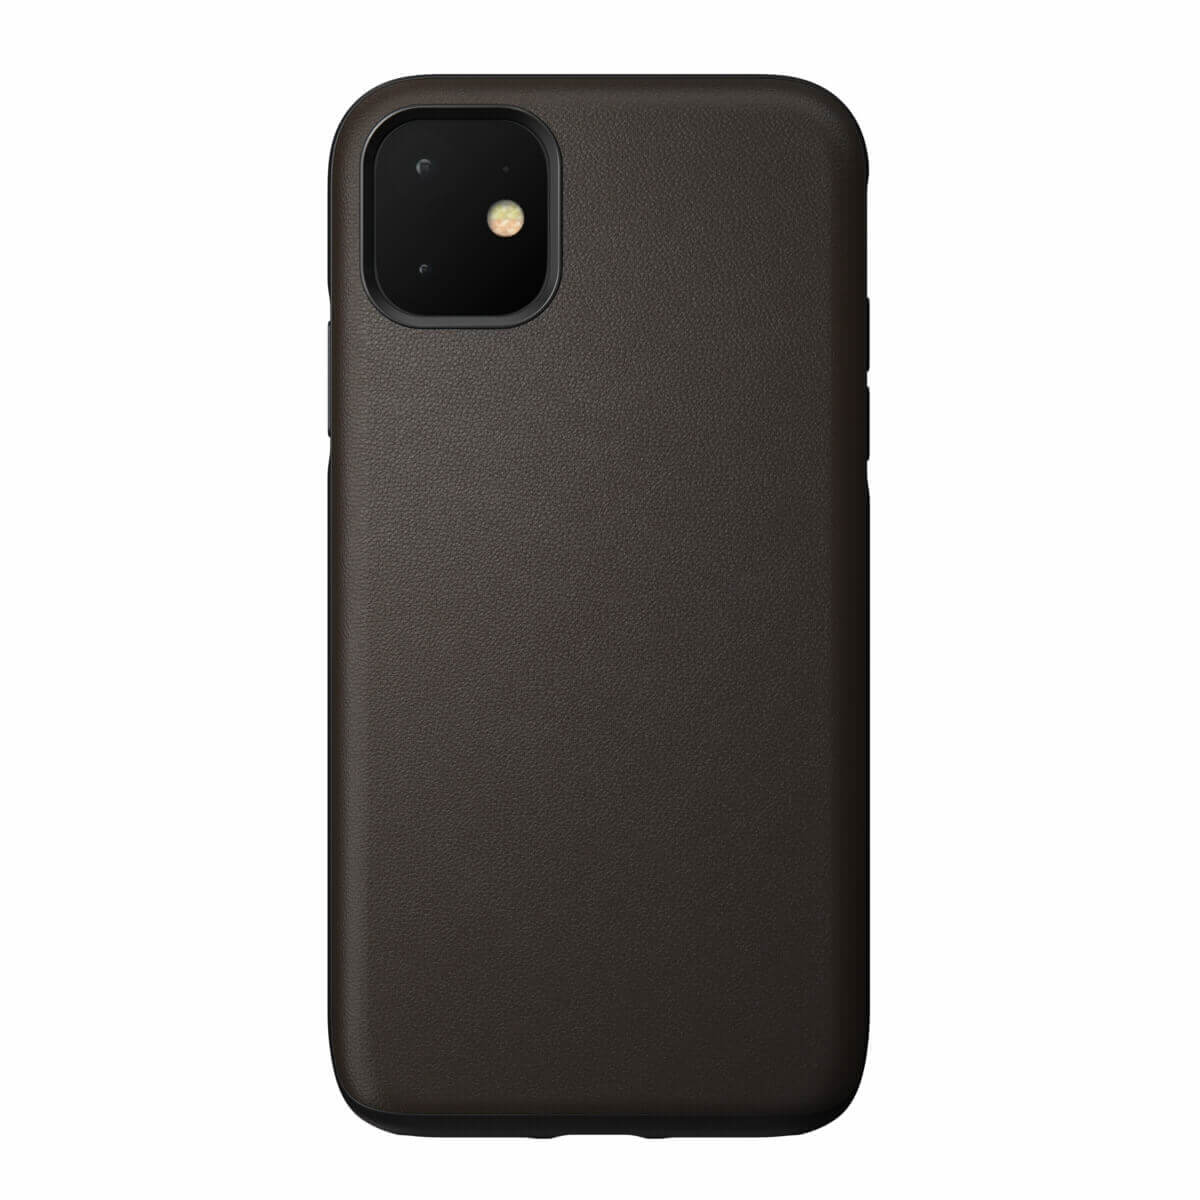 Nomad Leather Rugged Waterproof Case — кожен (естествена кожа) кейс за iPhone 11 (кафяв) - 3